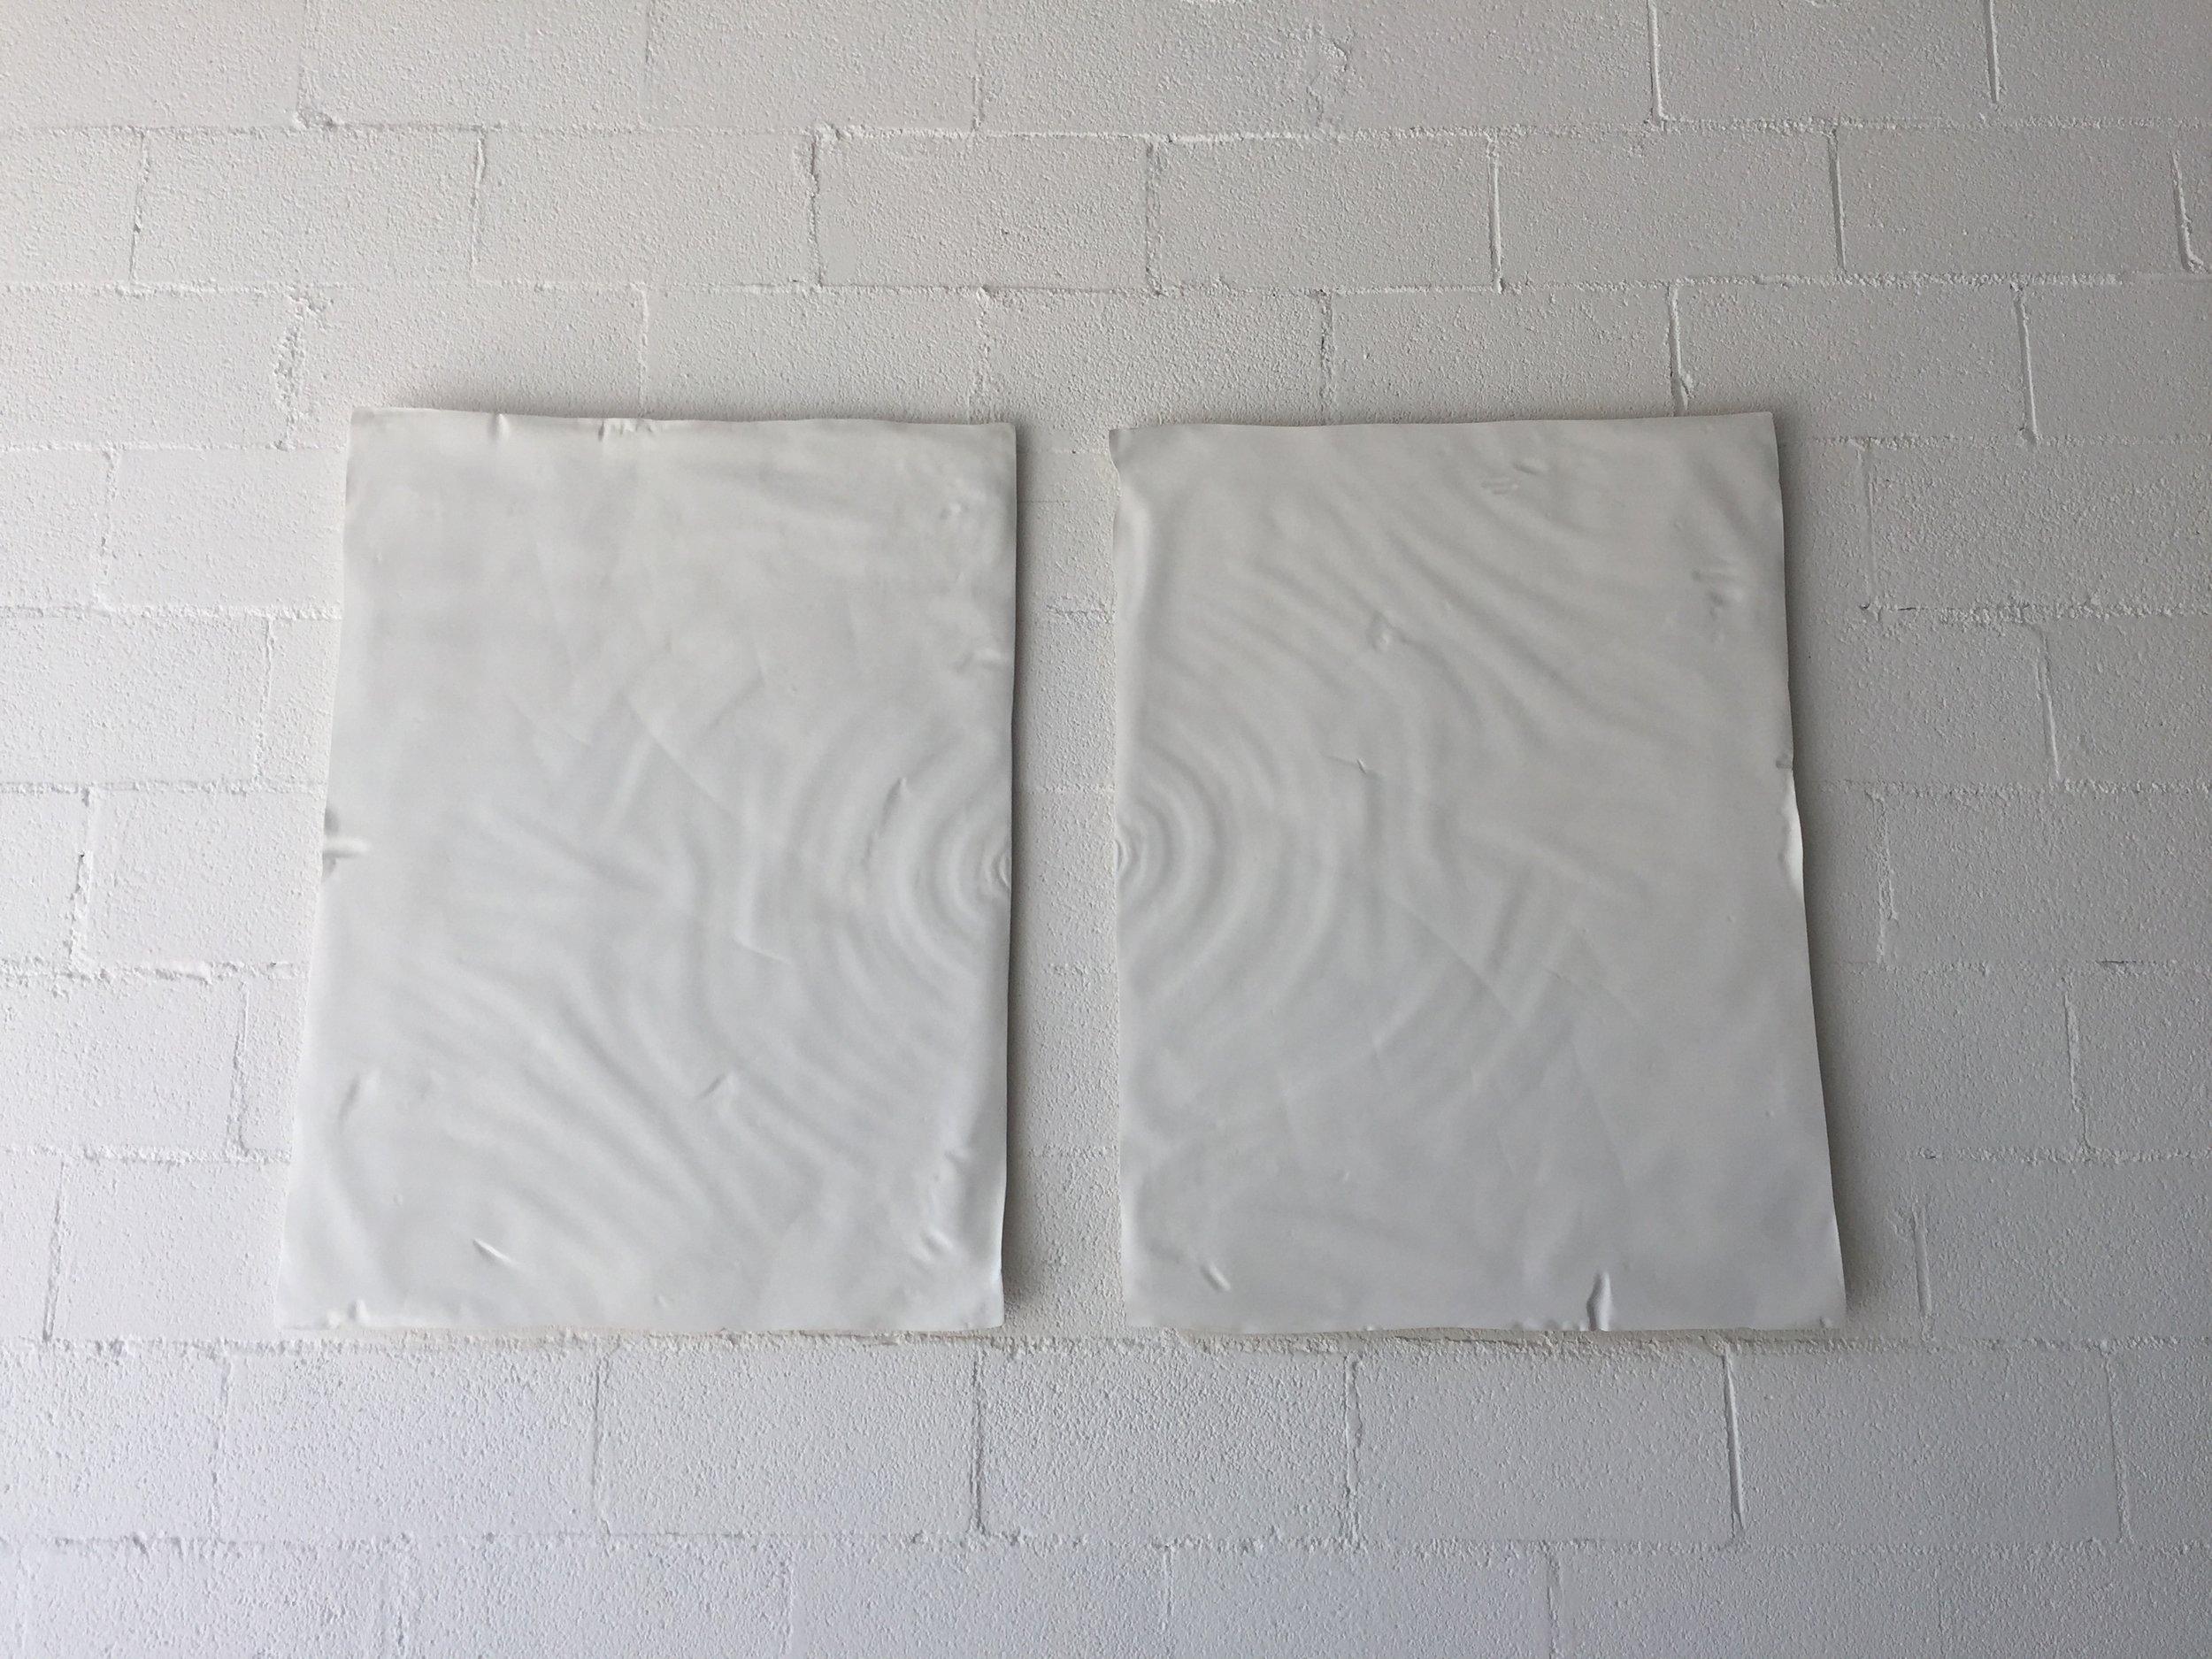 relief (poster) 2017. Aldama Fabre Gallery, Bilbao